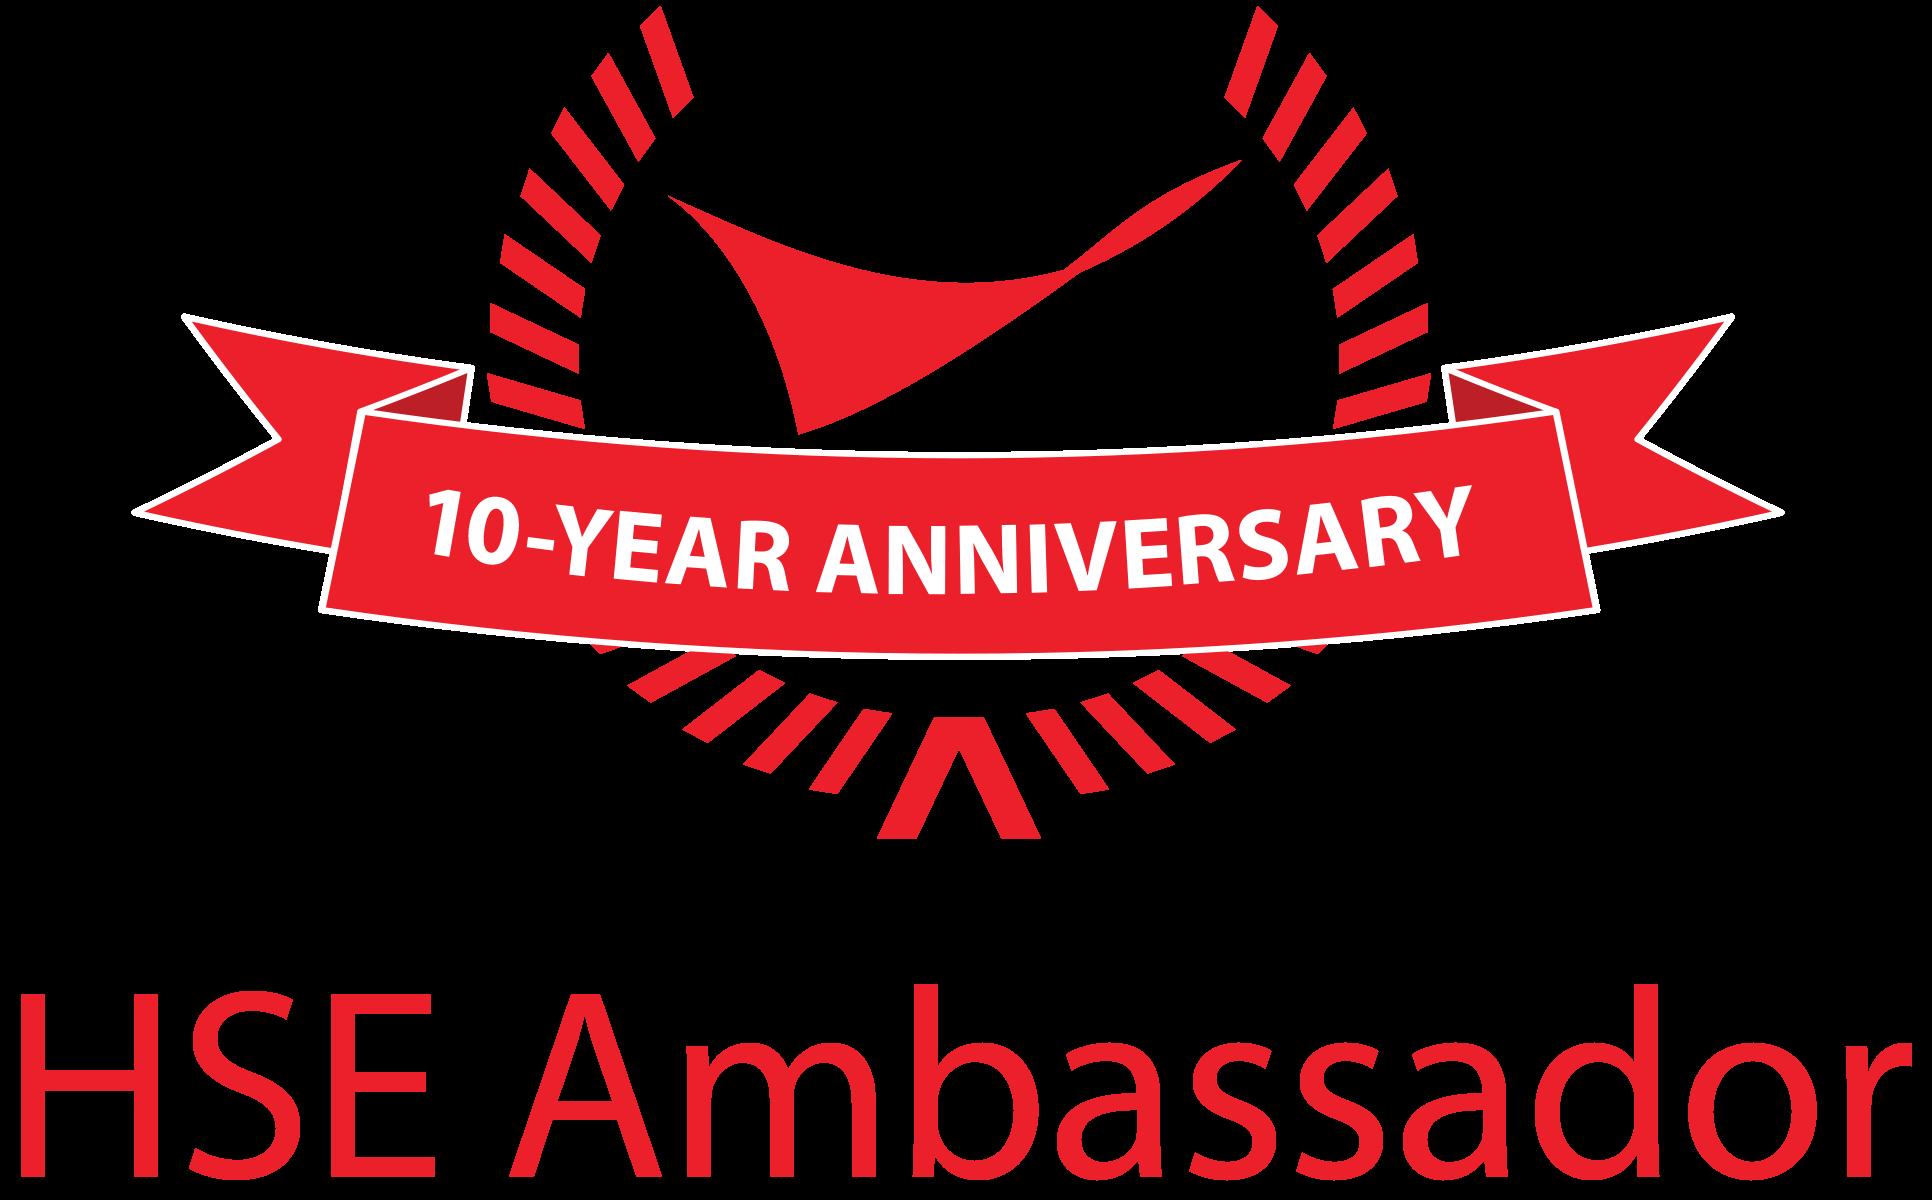 HSE Ambassador graphic